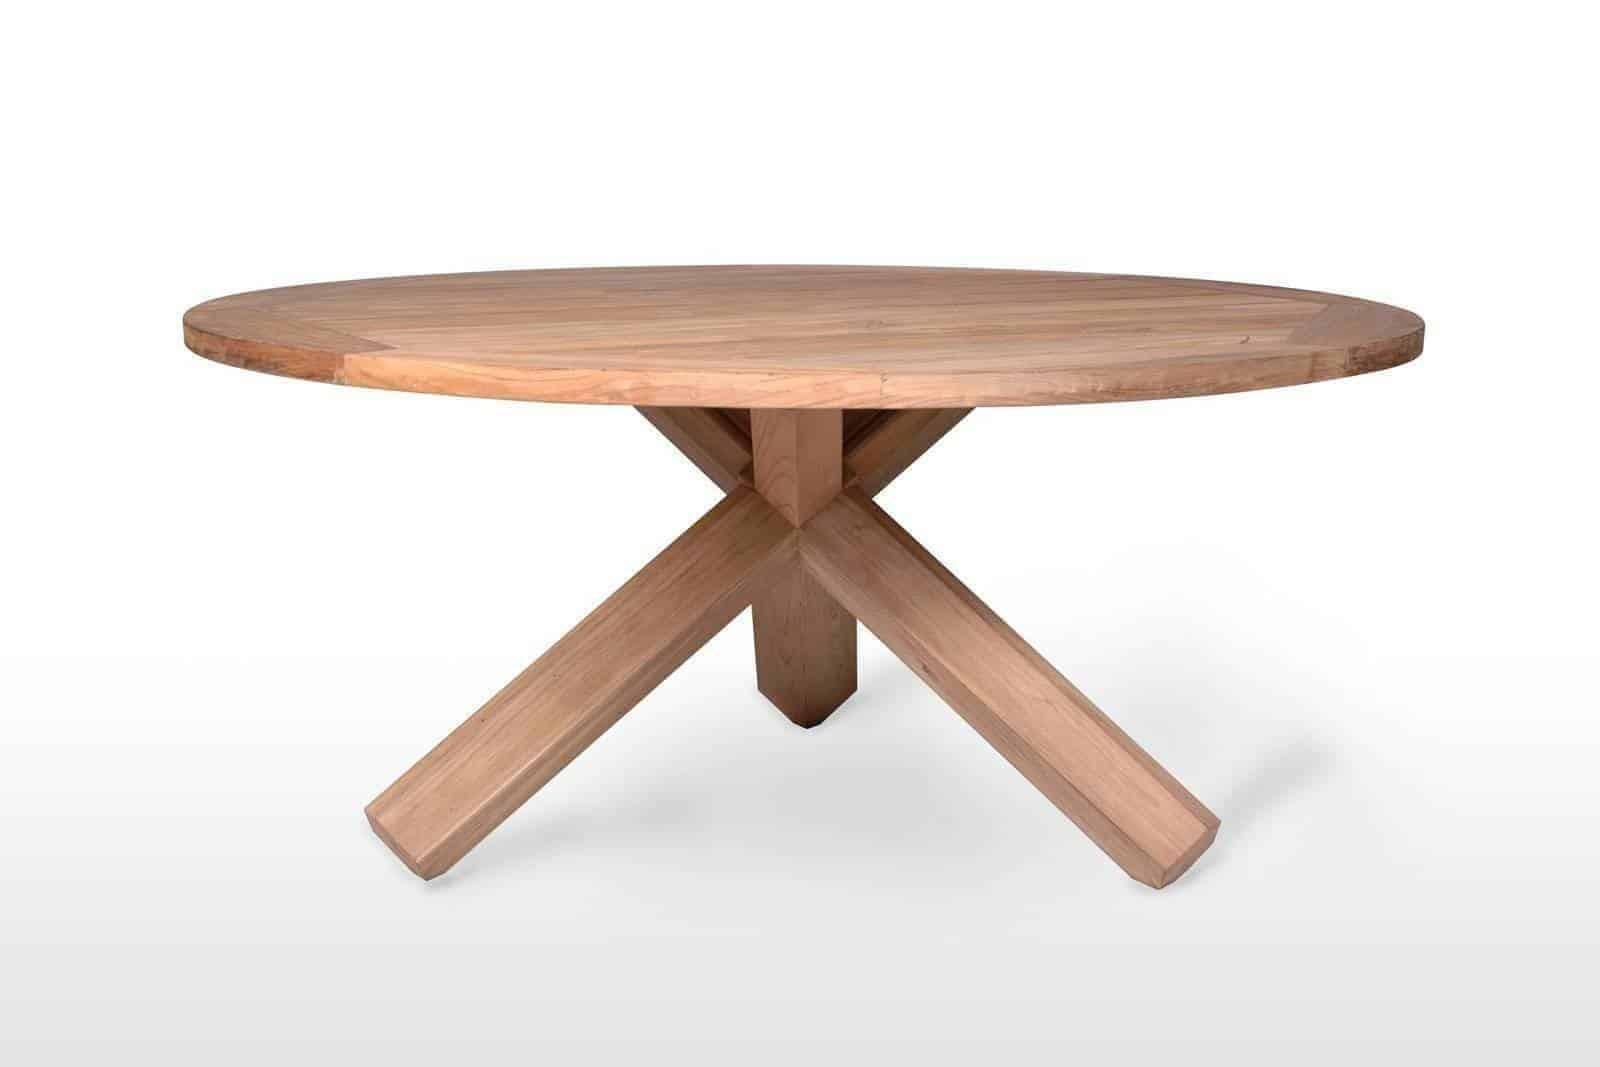 Садовый стол из тика BORDEAUX Ø135 см